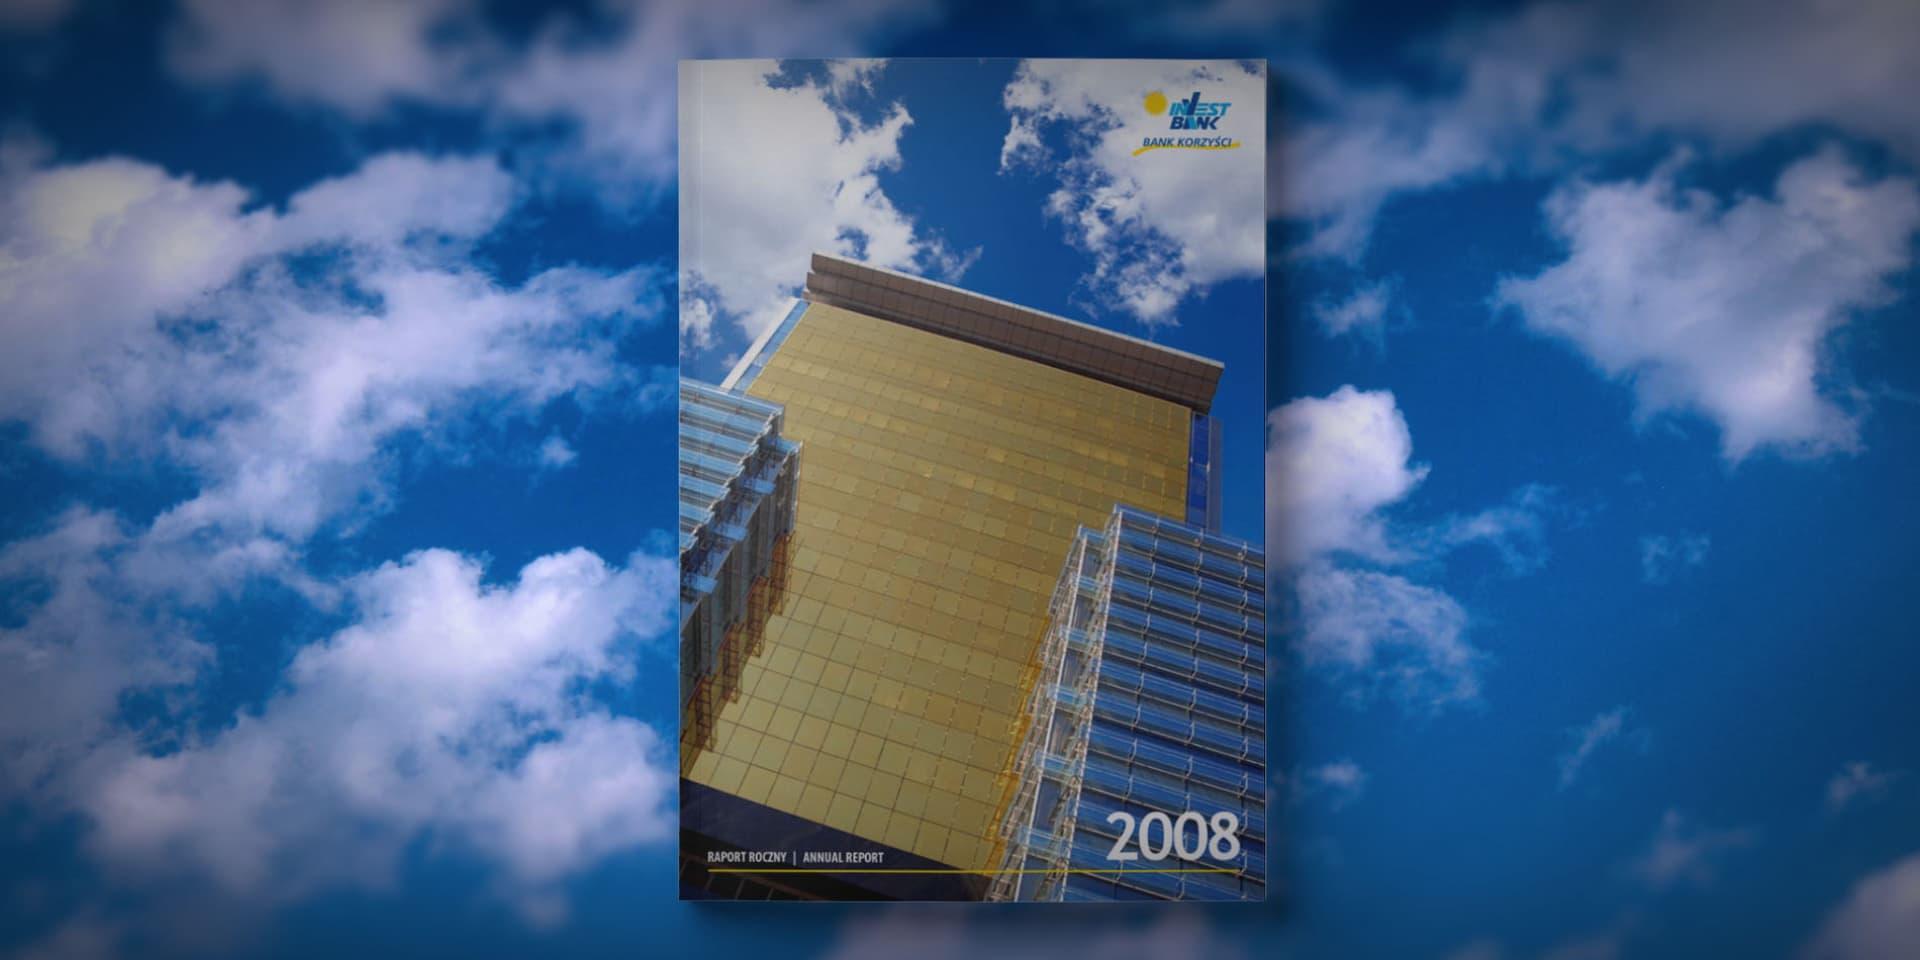 Invest Bank - raport roczny 2008